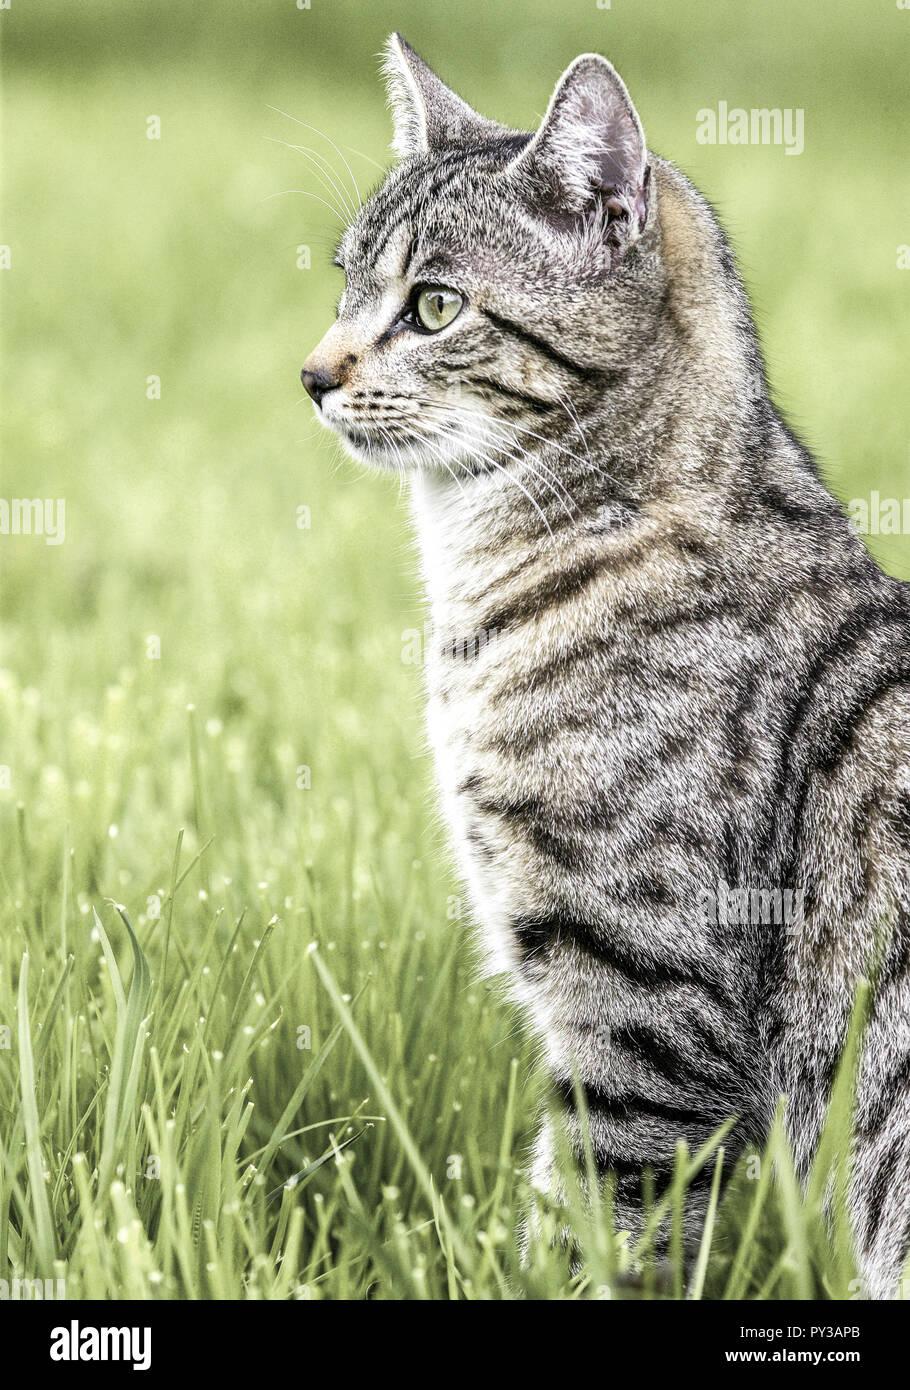 Katze sitzt in Wiese Stock Photo